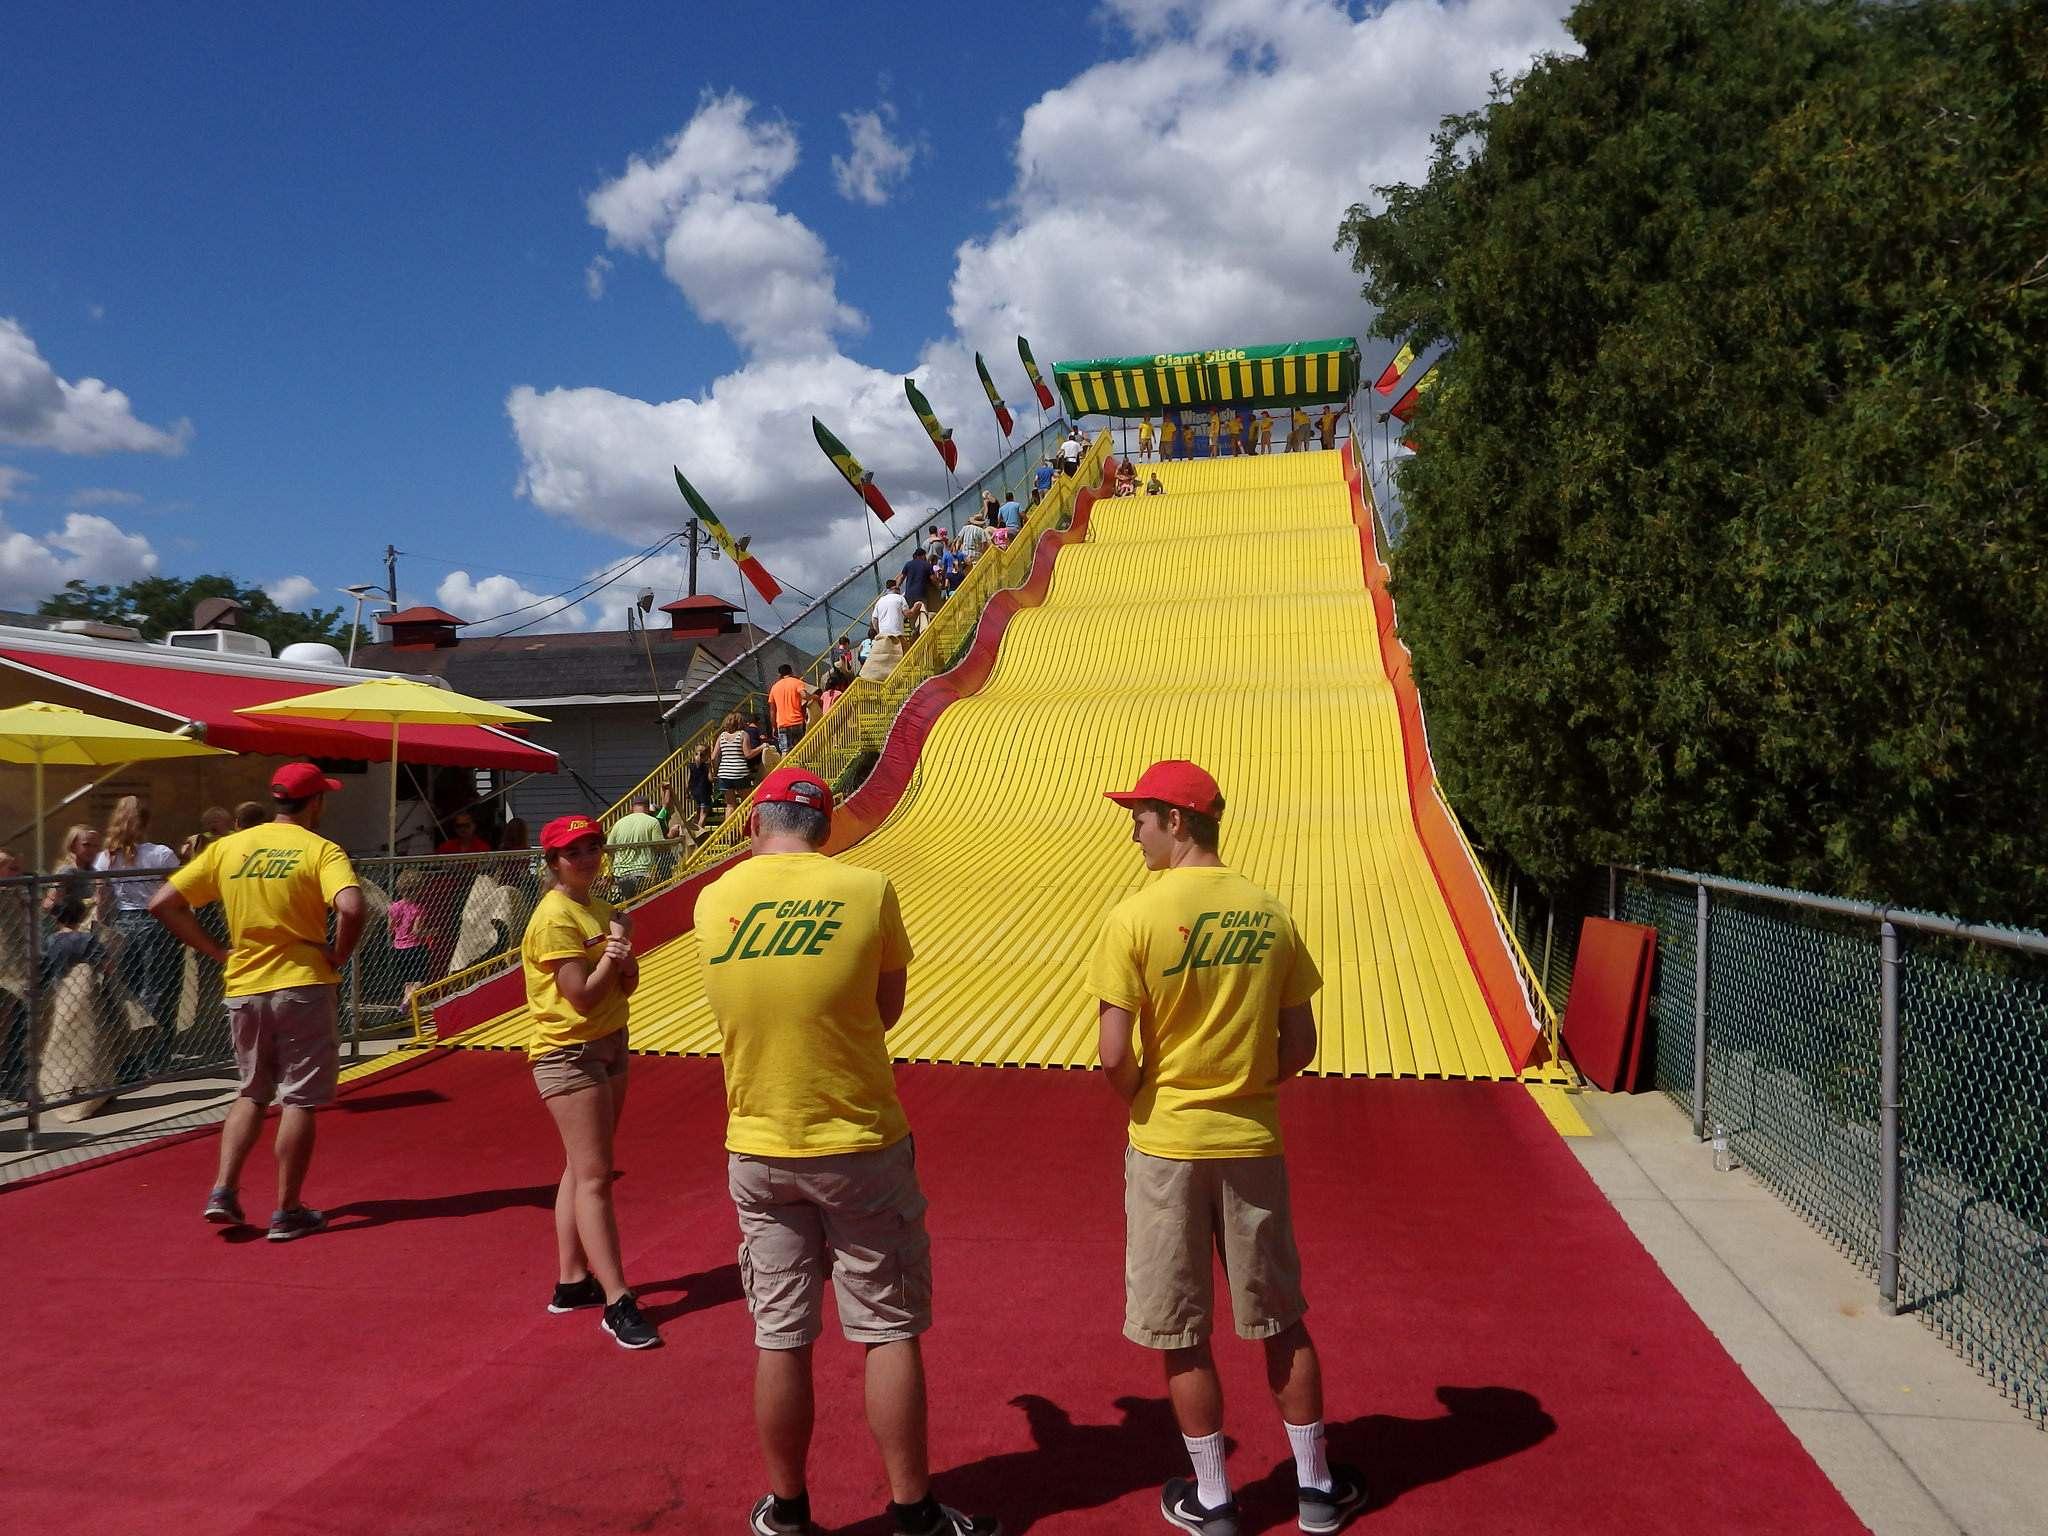 wisconsin state fair Wisconsin State Fair 2016